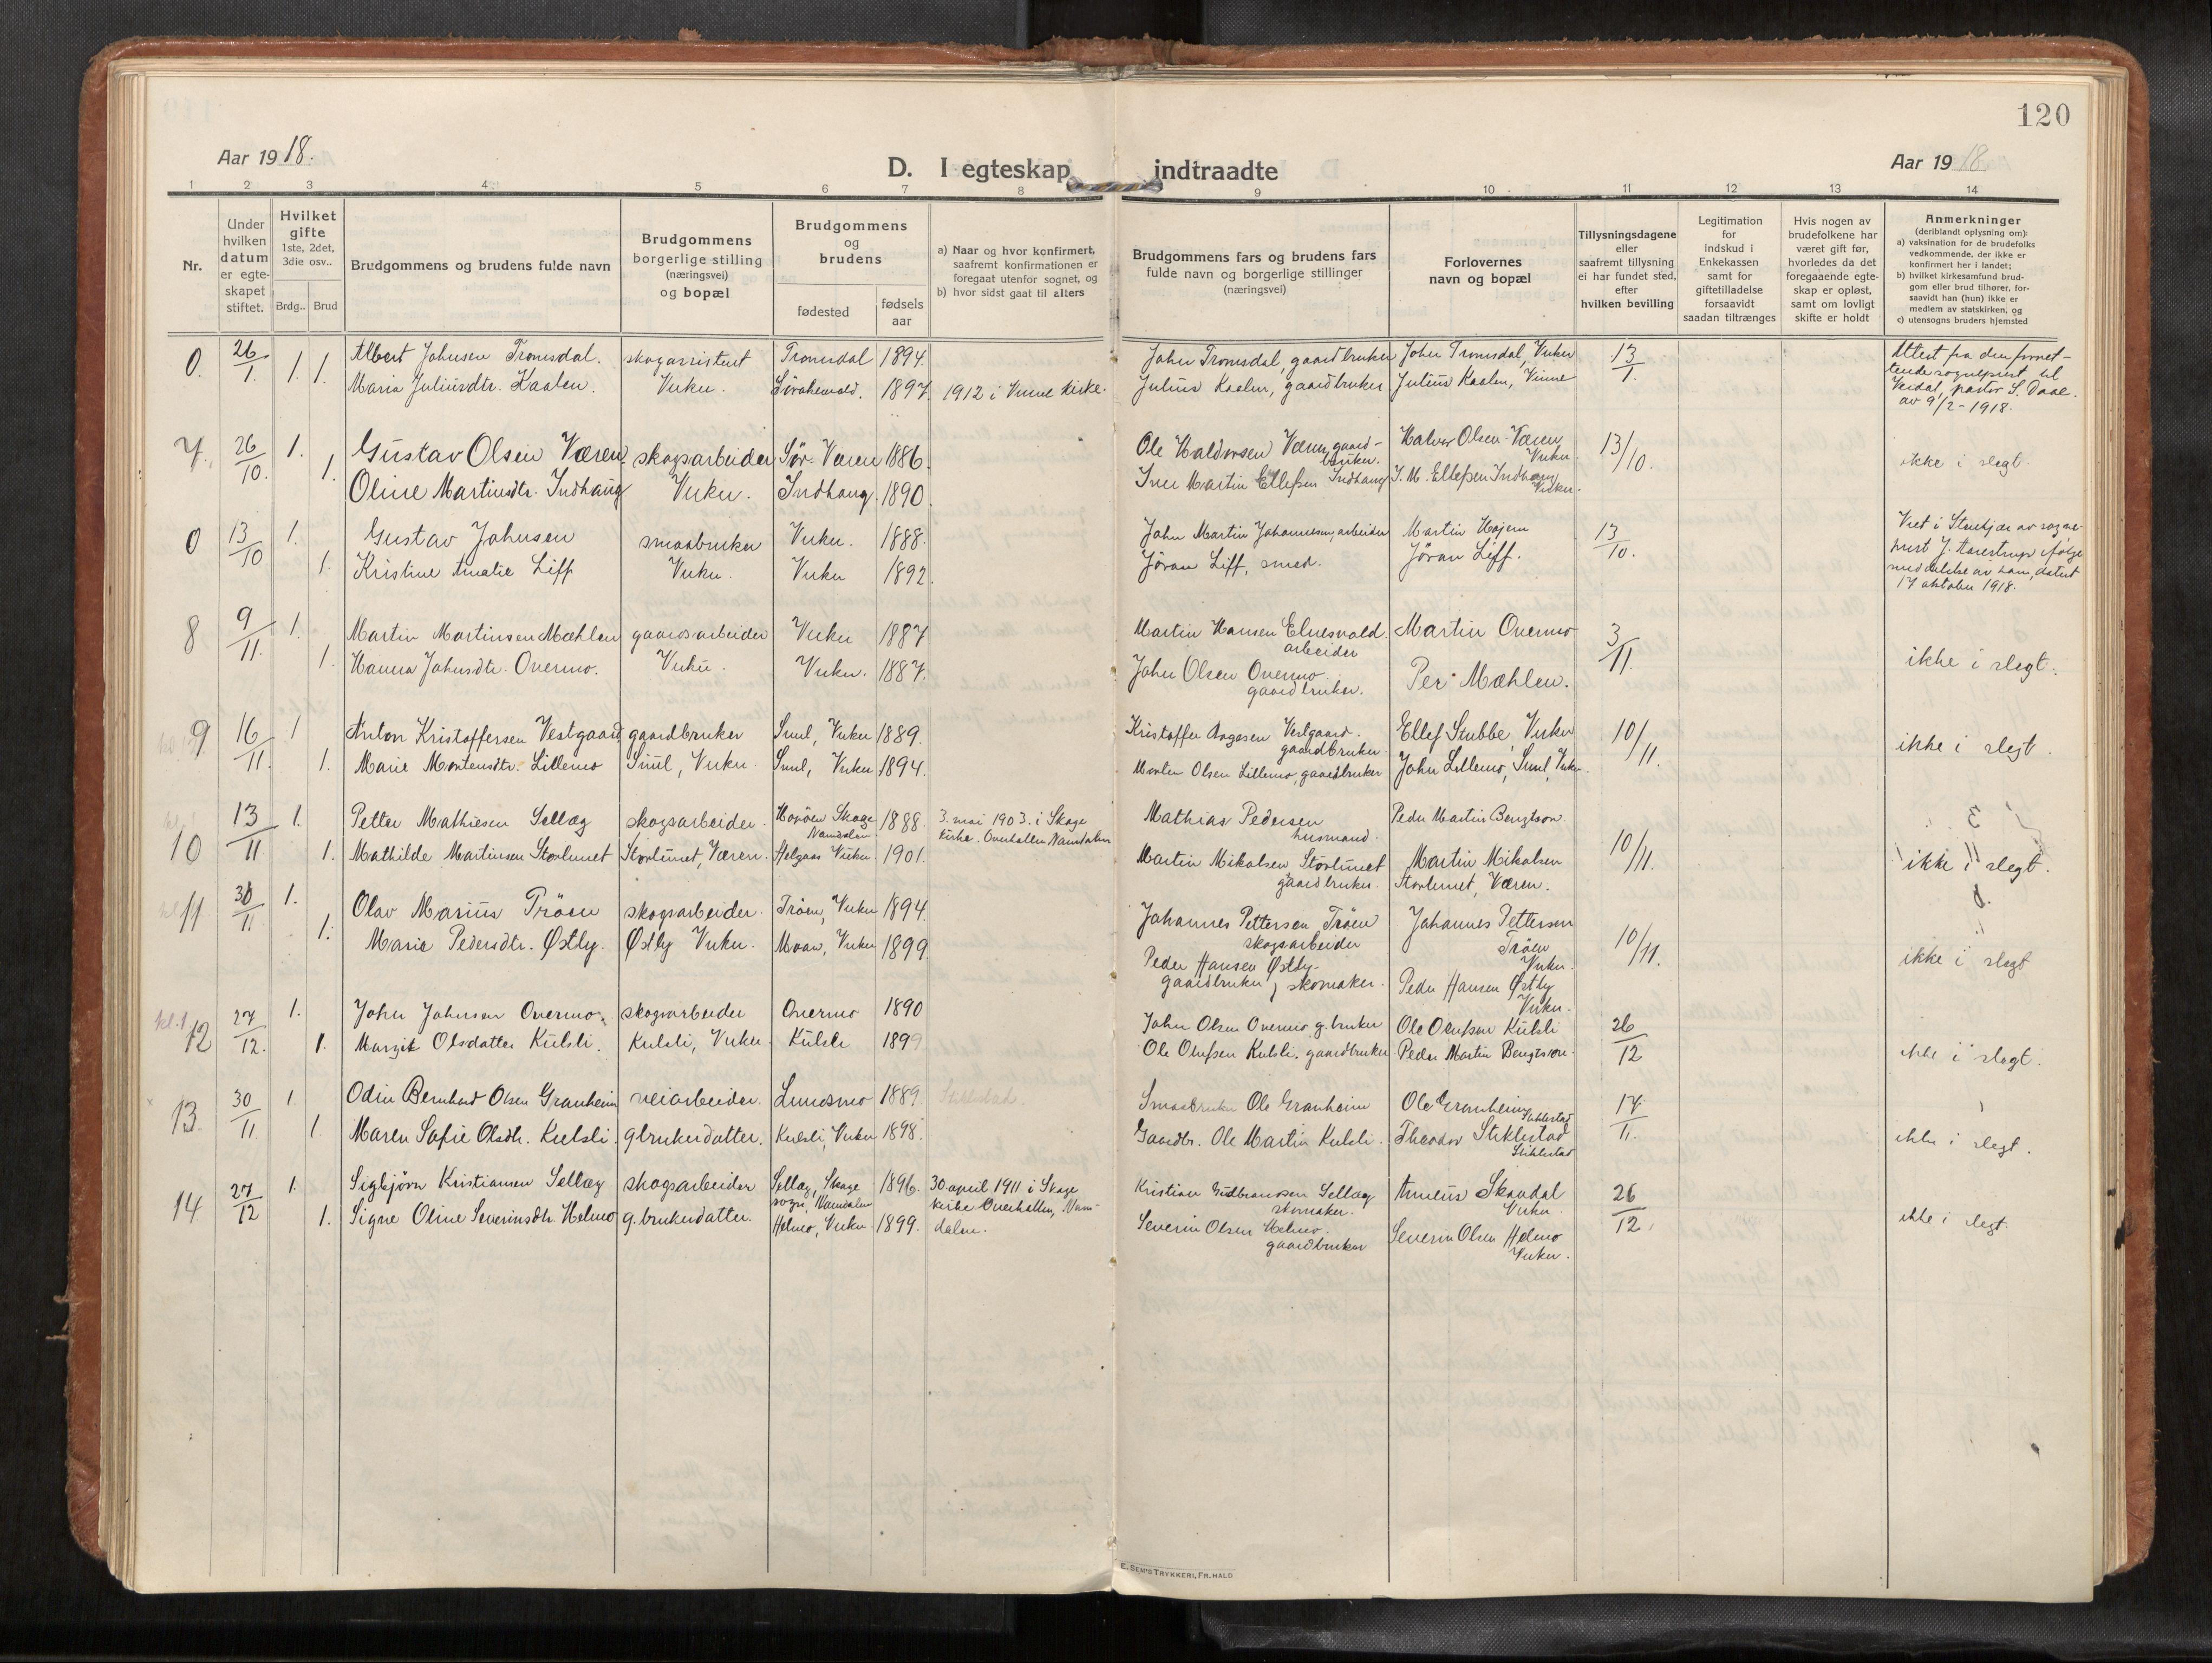 SAT, Verdal sokneprestkontor, H/Haa/L0004: Ministerialbok nr. 4, 1916-1928, s. 120